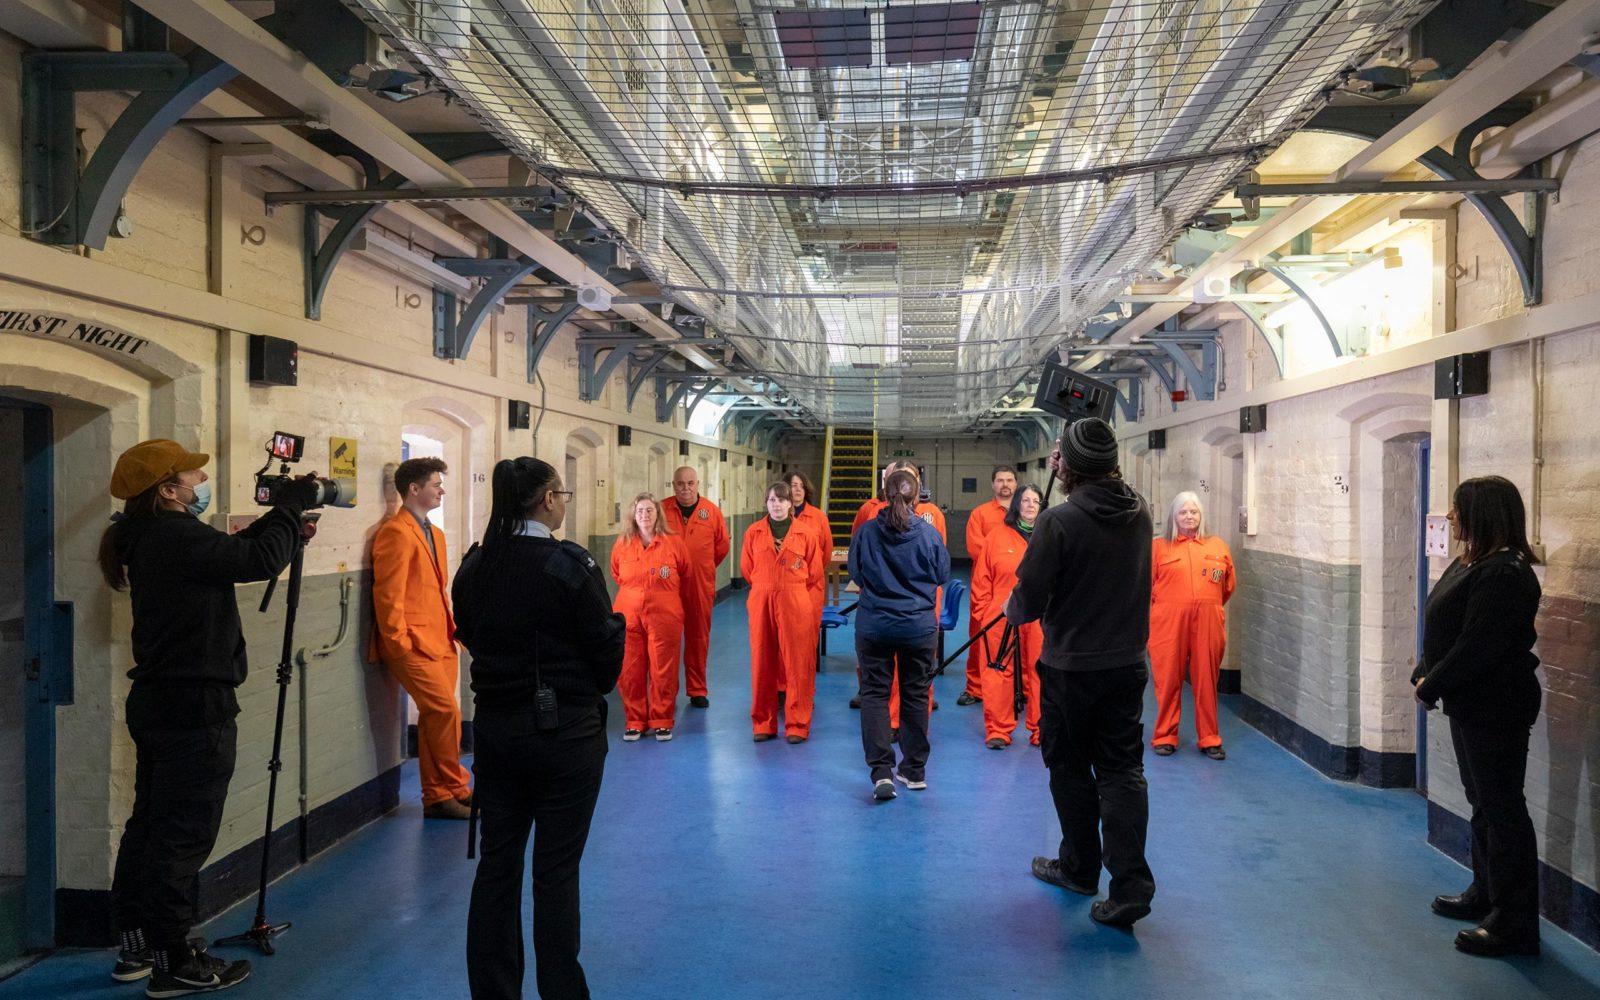 Shrewsbury Prison Production and Film Location